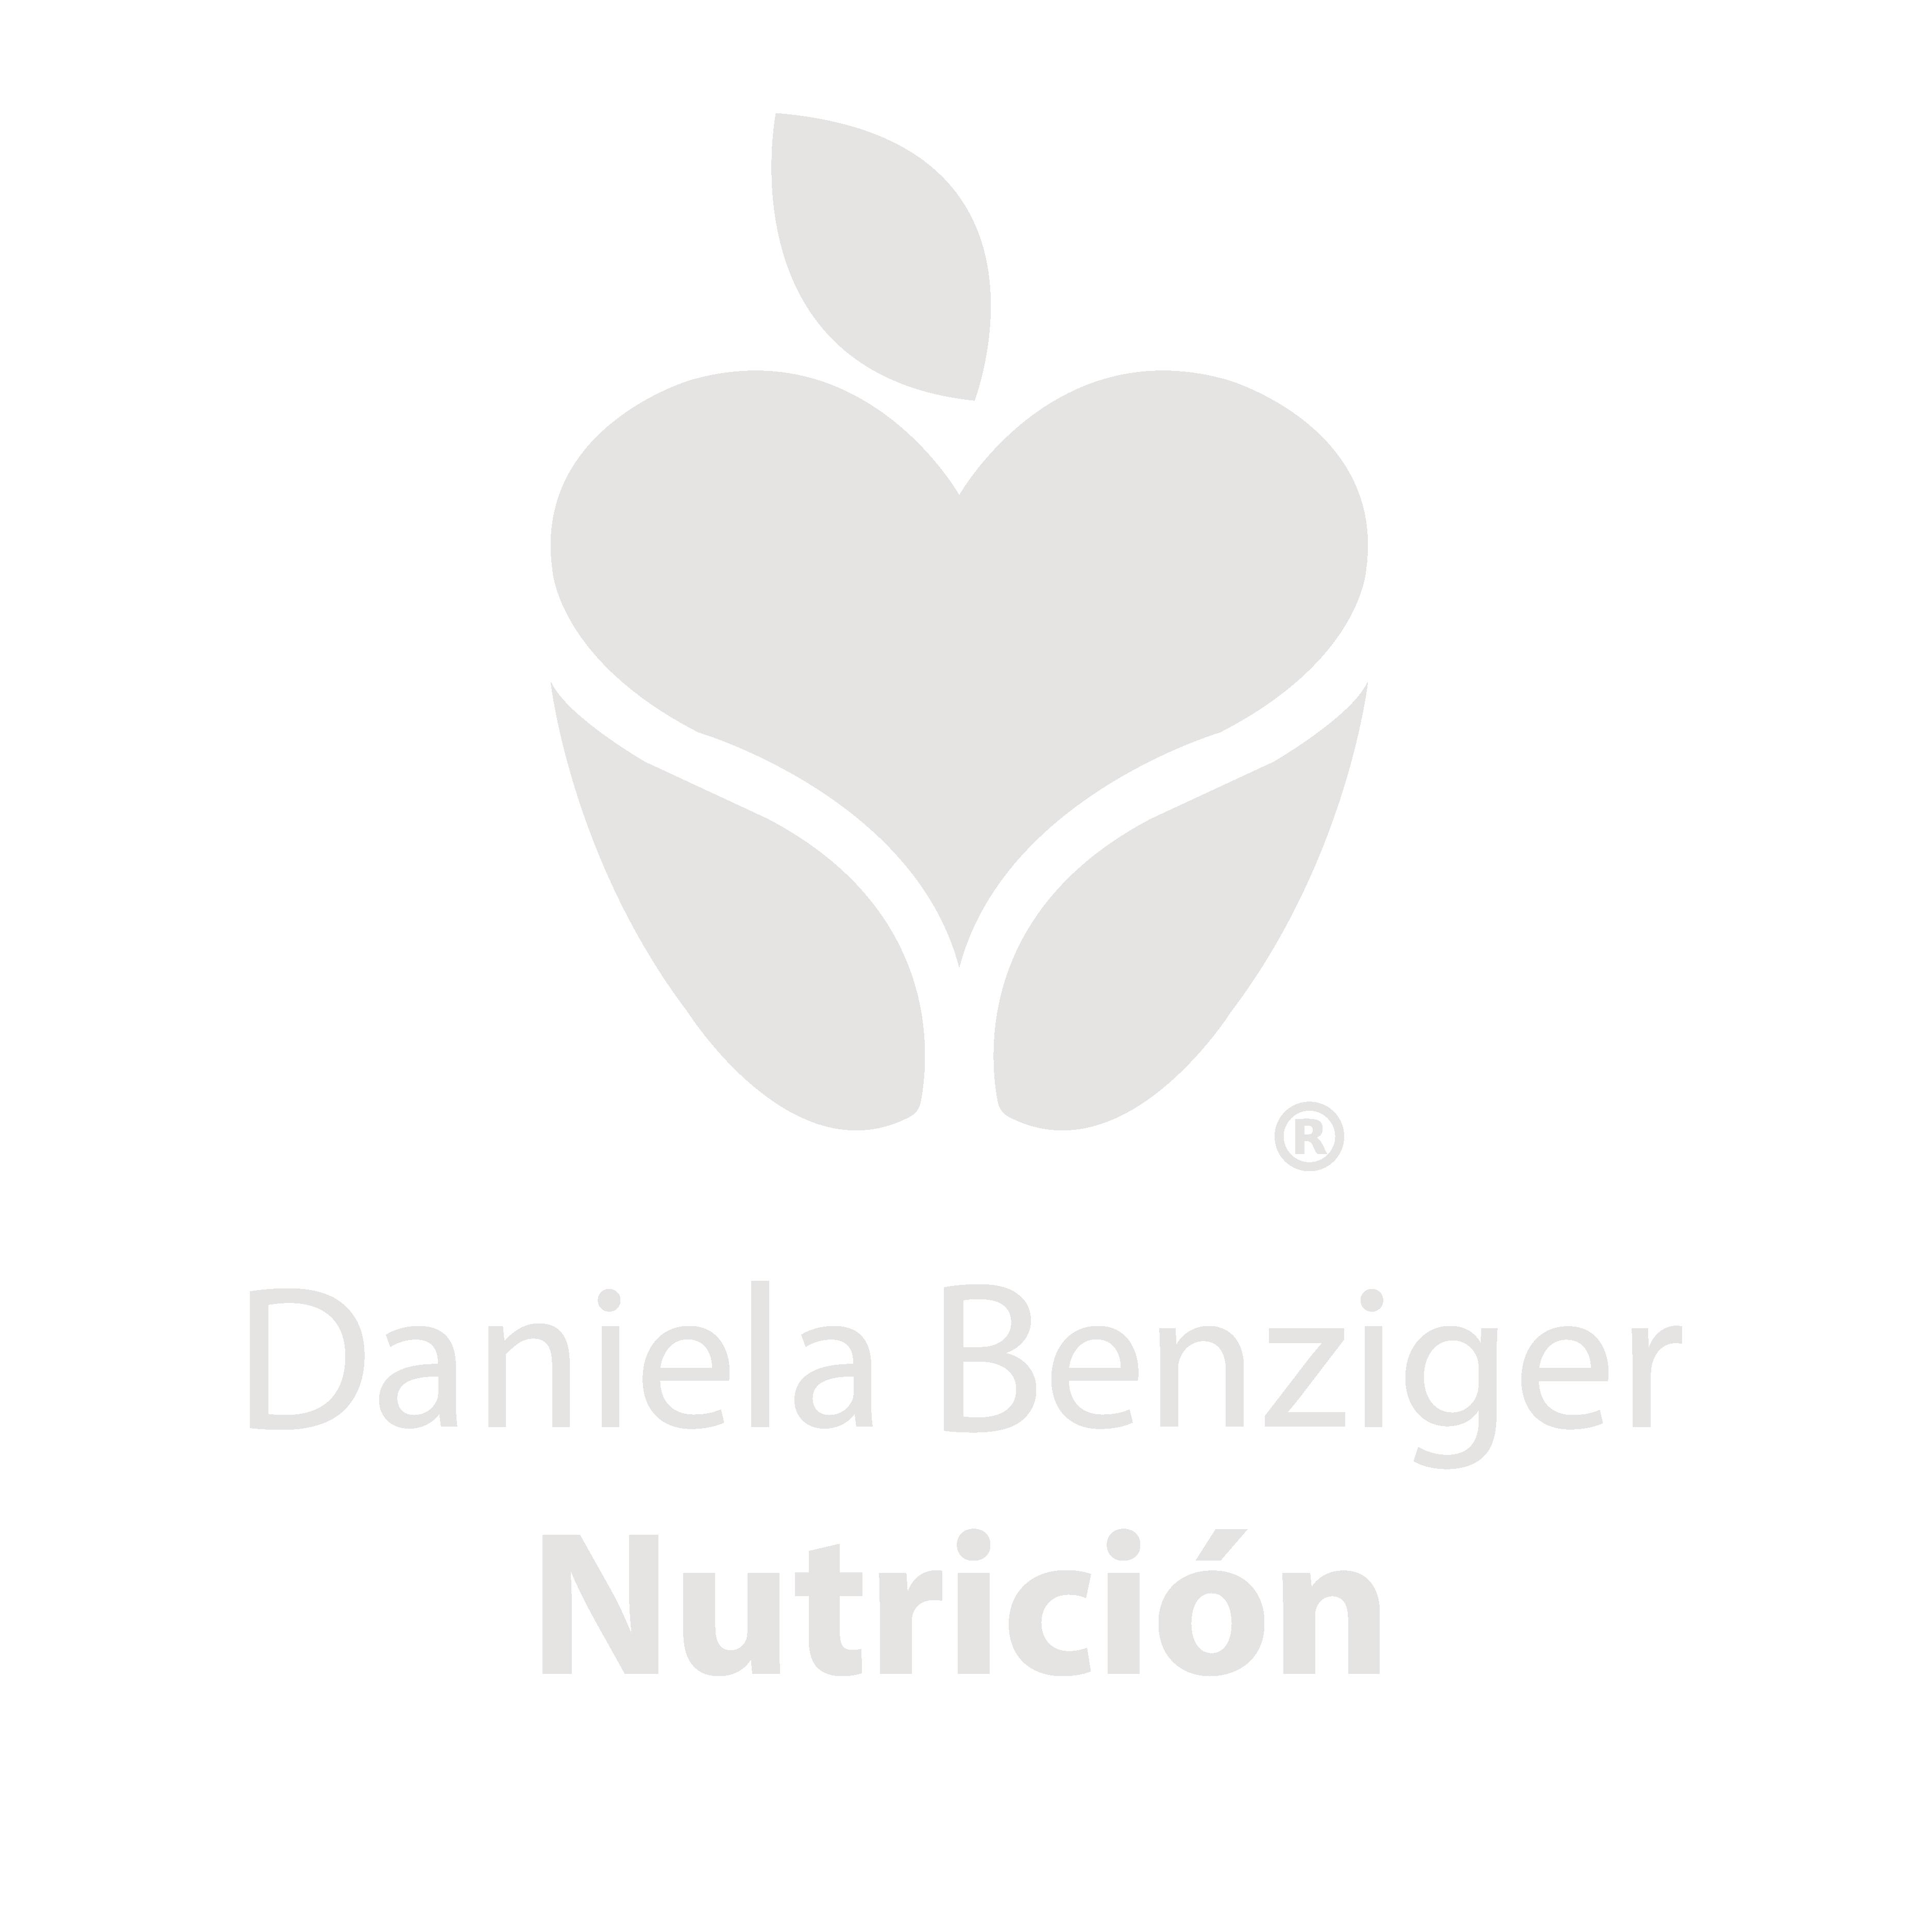 Daniela Benziger